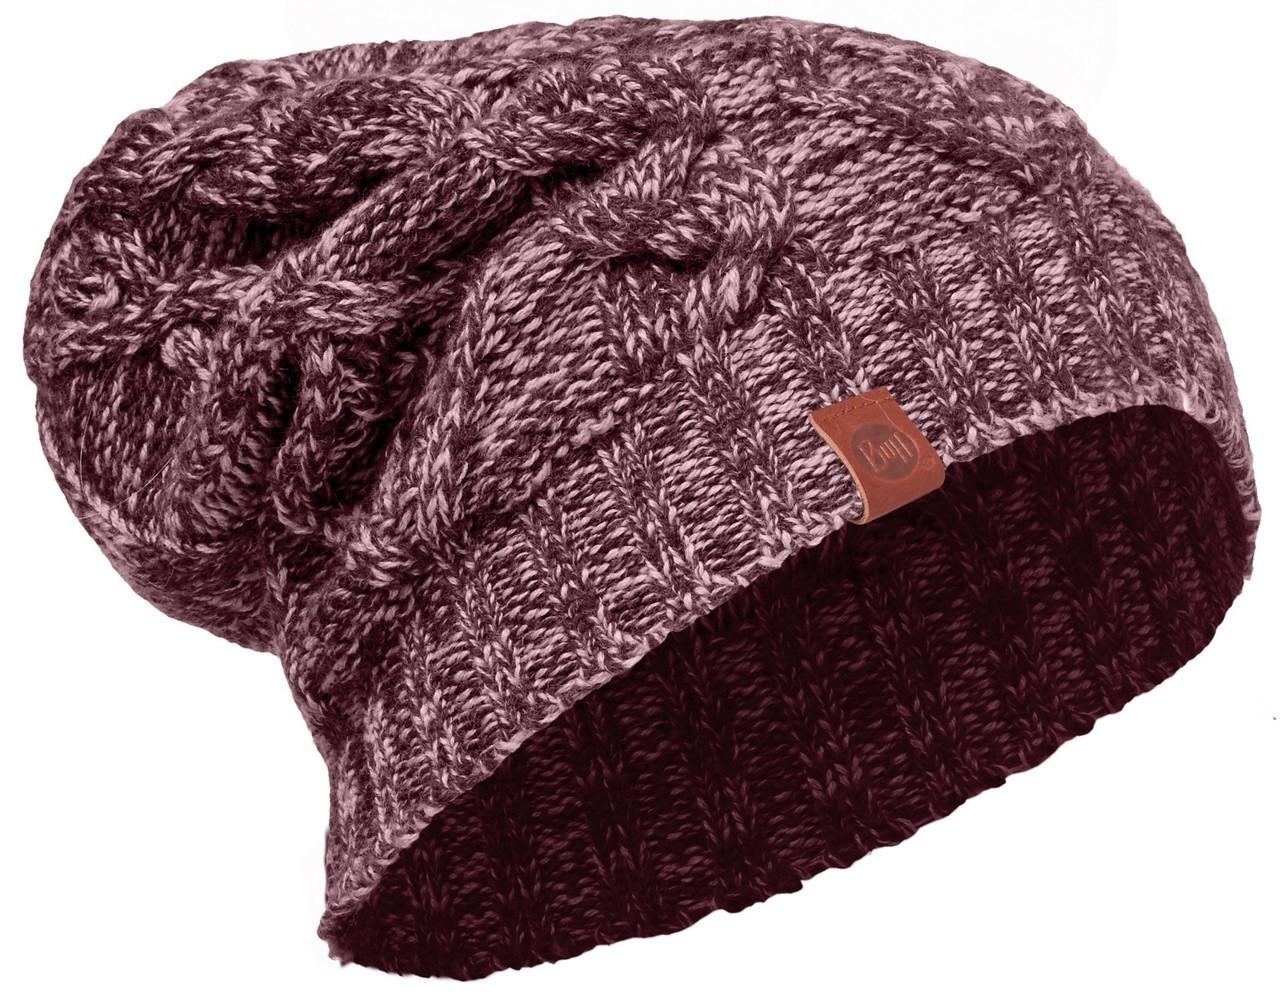 Длинные шапки Вязаная шапка-бини Buff Nuba Heather Rose 2008.557.10.jpg